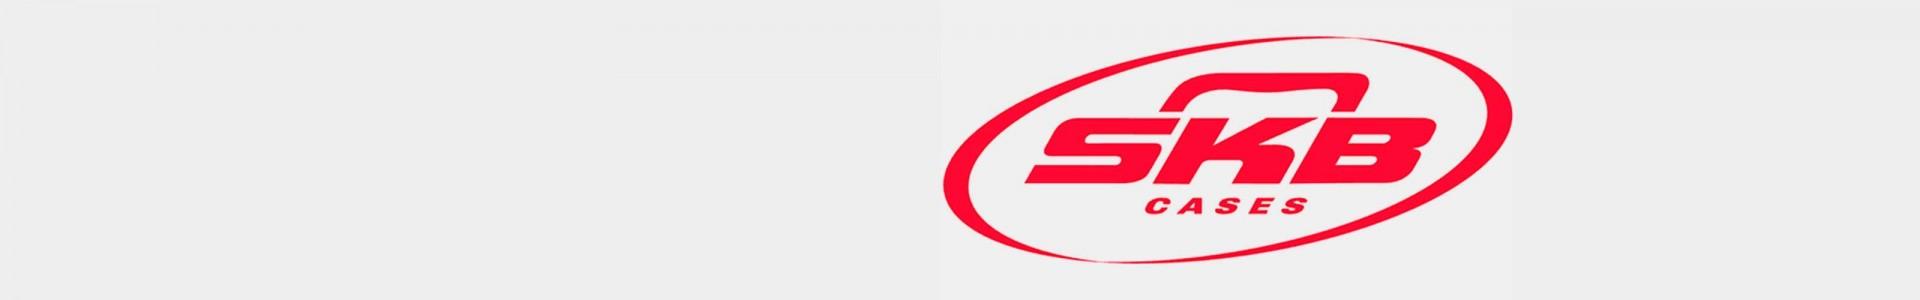 SKB - Maletas transporte equipo audiovisual - Avacab Audiovisuales